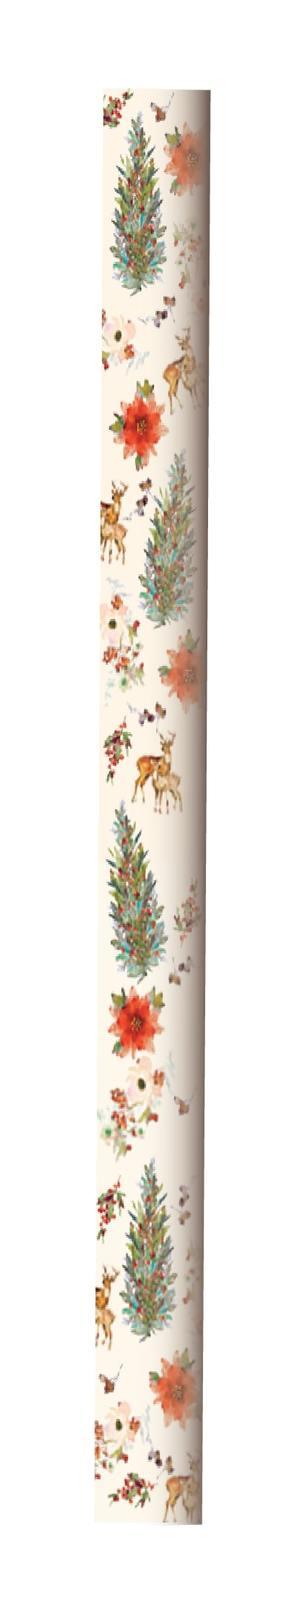 Hallmark: Christmas Wrap 5m Roll - Tree Wreath image